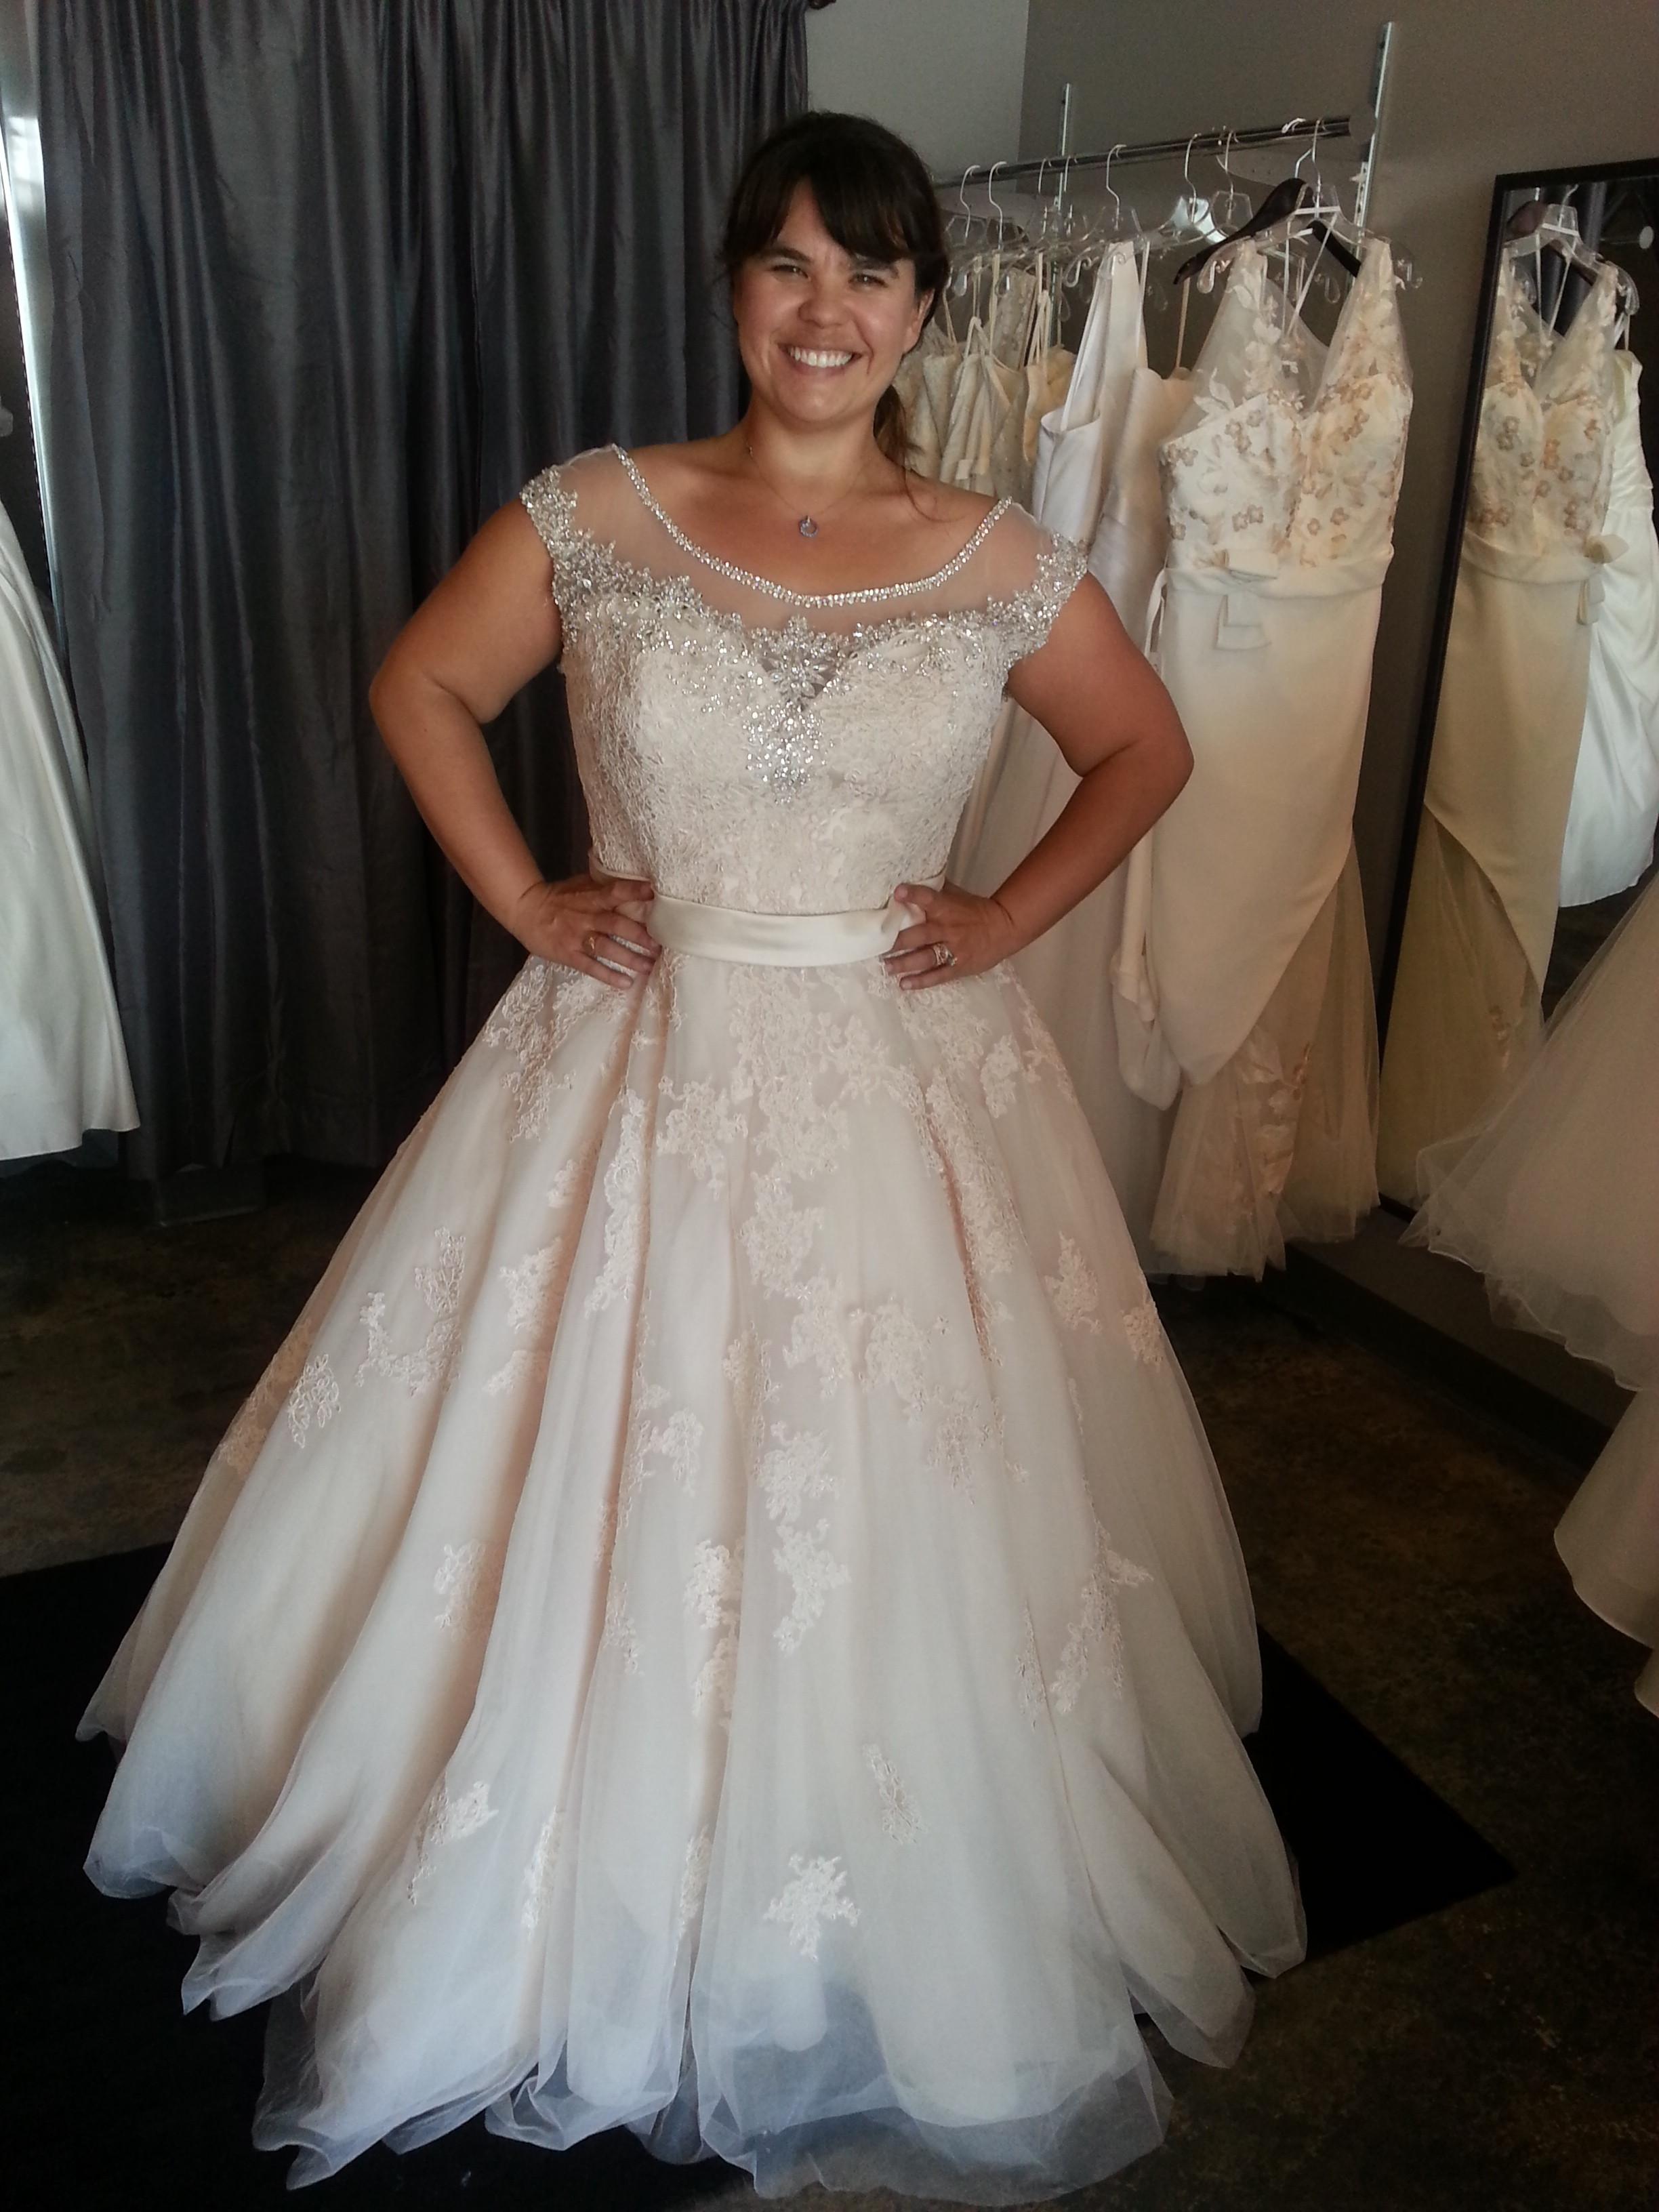 plus size wedding dress shopping plus size wedding gowns Plus size wedding dress shopping Plus Size Ballgown Wedding Dress